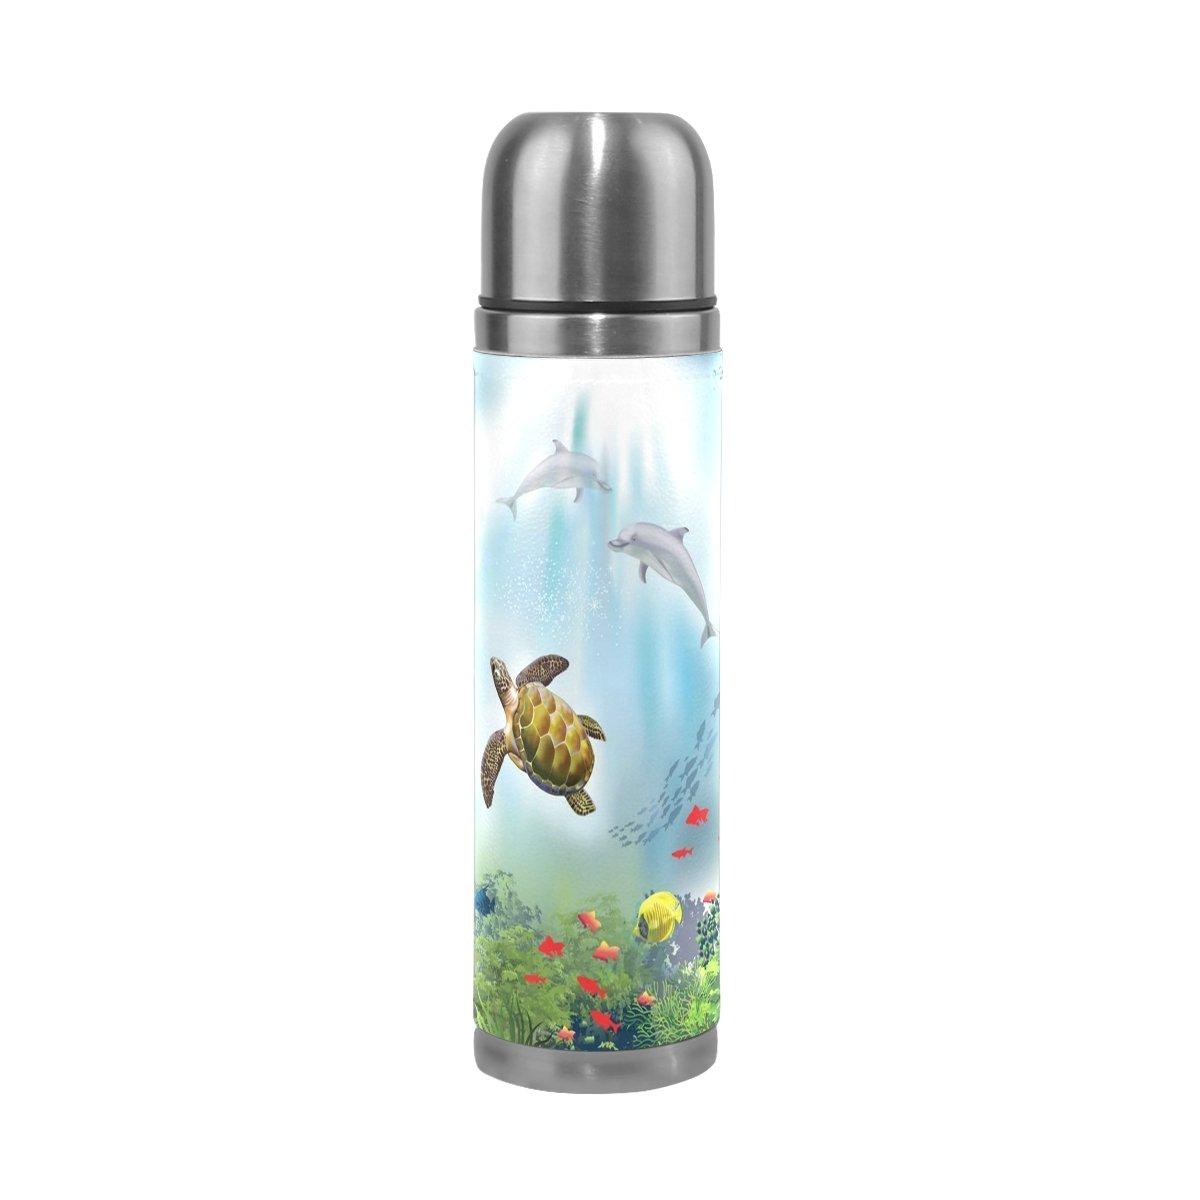 Alaza 17 oz Underwater World Sea Turtle Dolphin二重壁真空カップ断熱ステンレススチールPUレザー旅行マグ、クリスマス誕生日プレゼントfor Mom Dad Boys Girls Kids恋人友達   B074L3SCTV